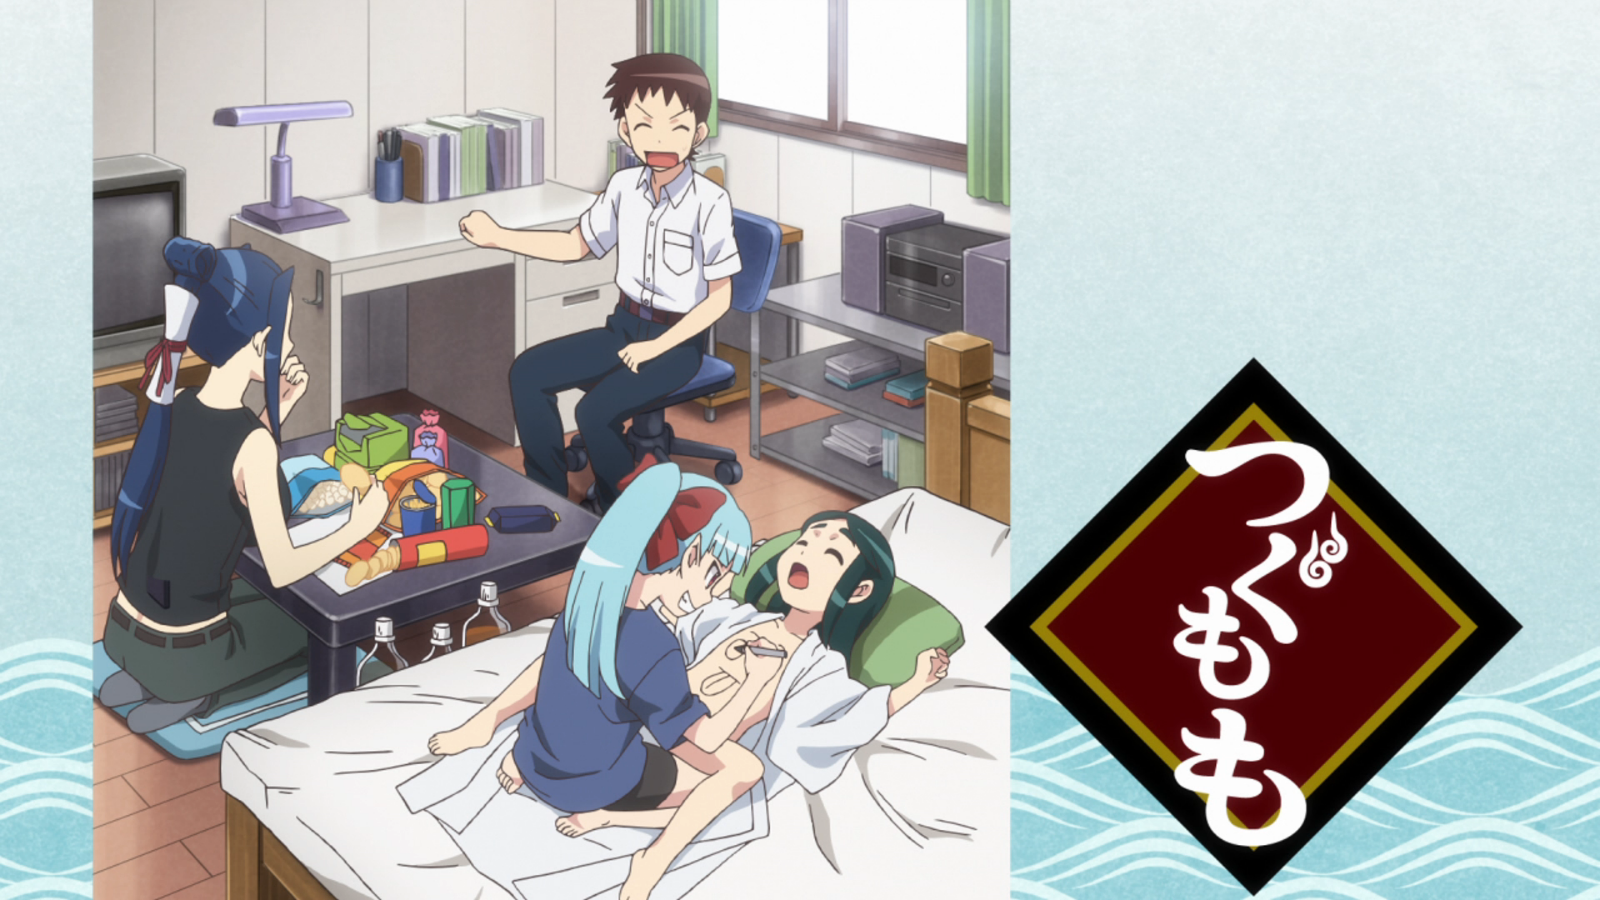 Image - Tsugumomo Ep 8 Eyecatch 1Png  Animevice Wiki  Fandom Powered By Wikia-8746